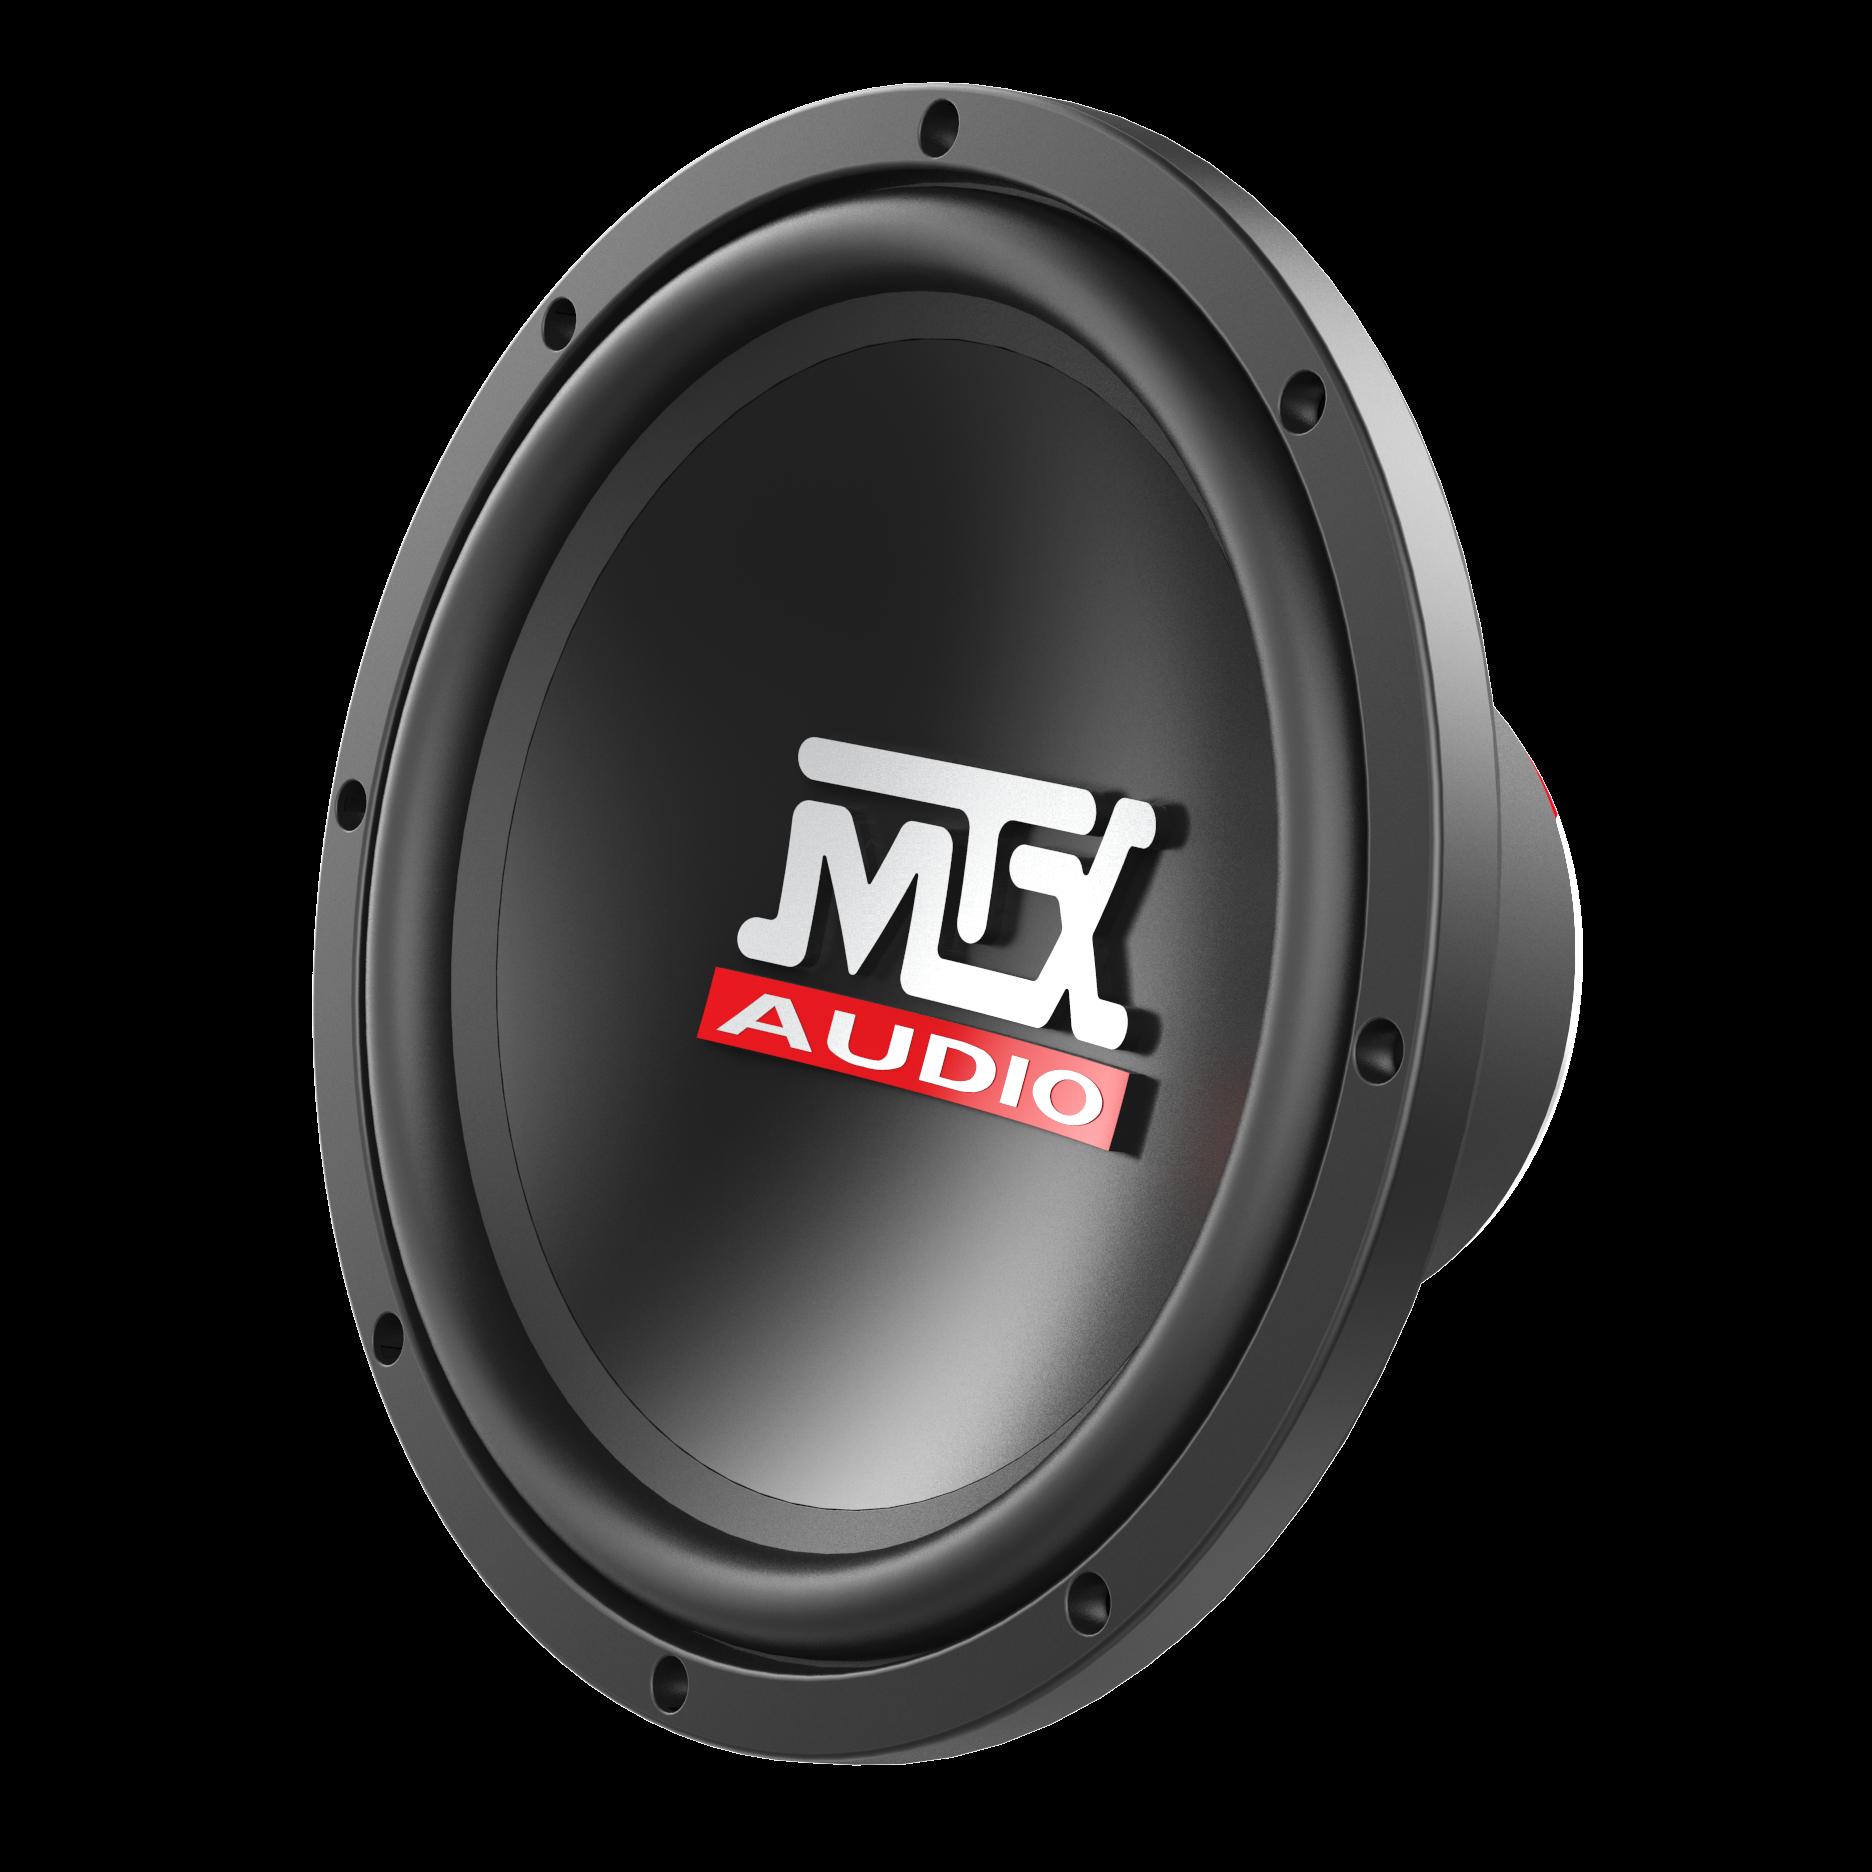 Mtx Bass Package The Best 8 Inch Subwoofer Best Shallow Mount 10 Subwoofer Subwoofer Enclosure Kicker Subwoofer